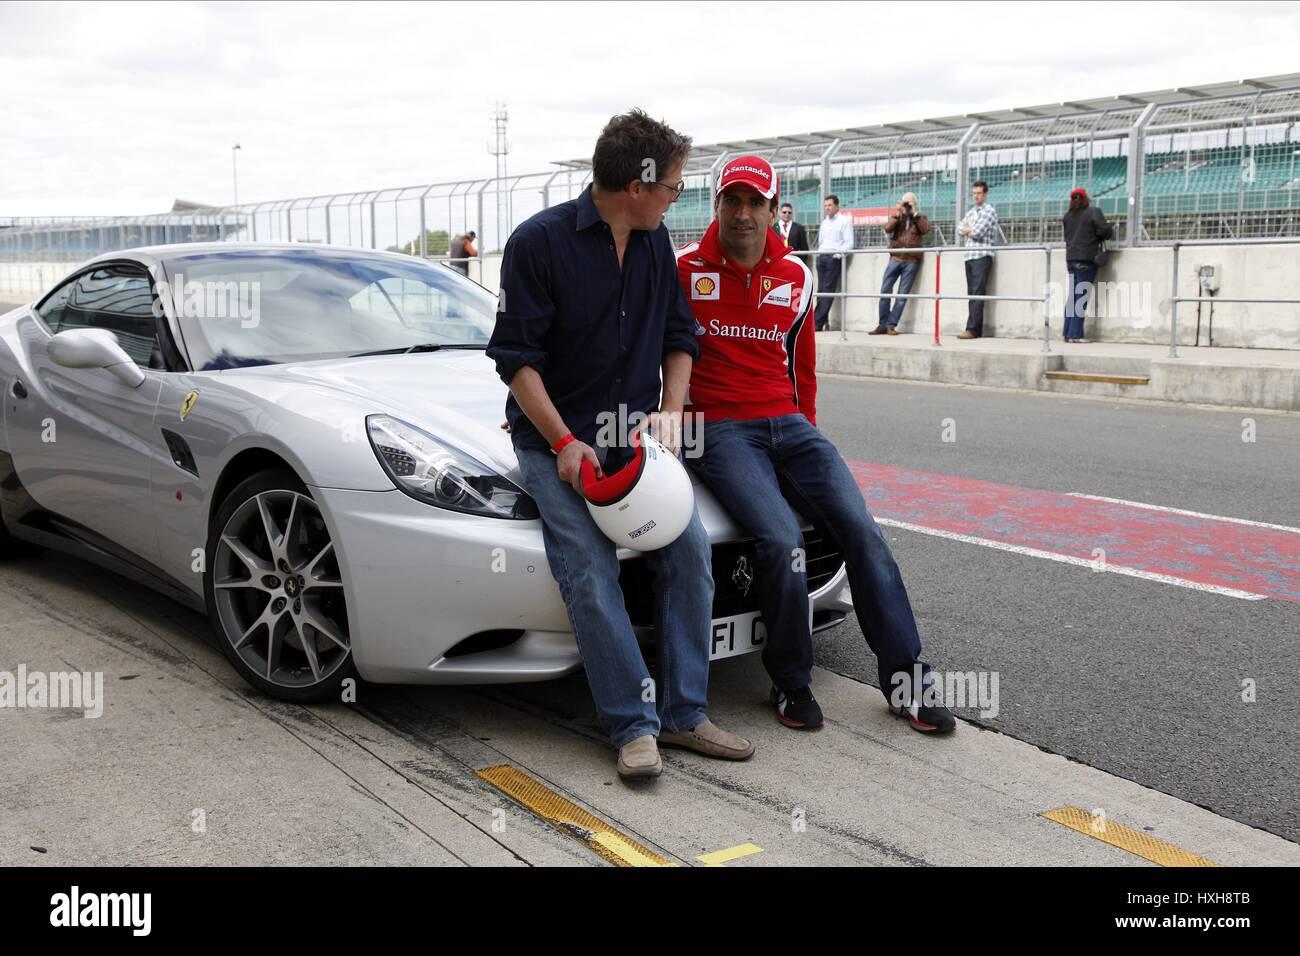 HUGH GRANT MARC GENE Schauspieler MOTOR RACING Fahrer Schauspieler & Motorsport-Fahrer SILVERSTONE ENGLAND 14. Stockbild